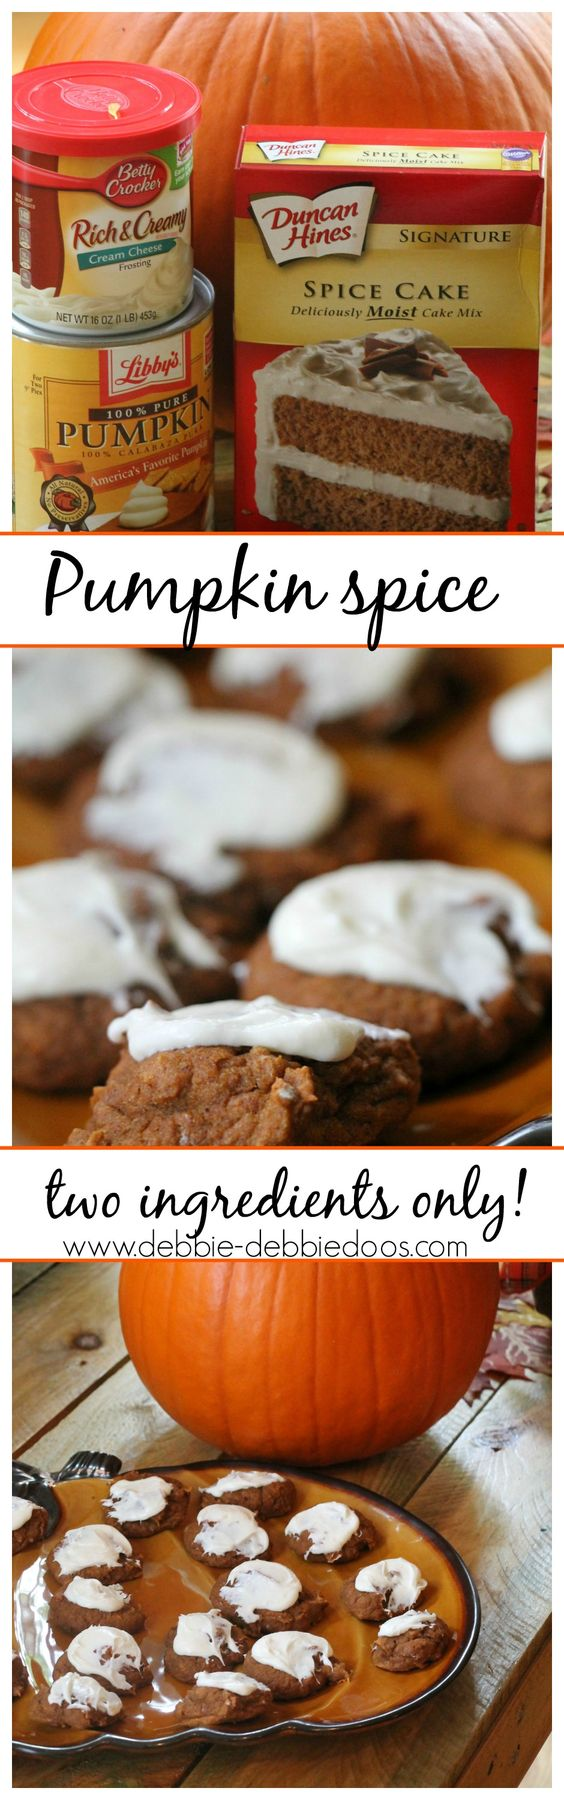 Spice cake cookie recipes